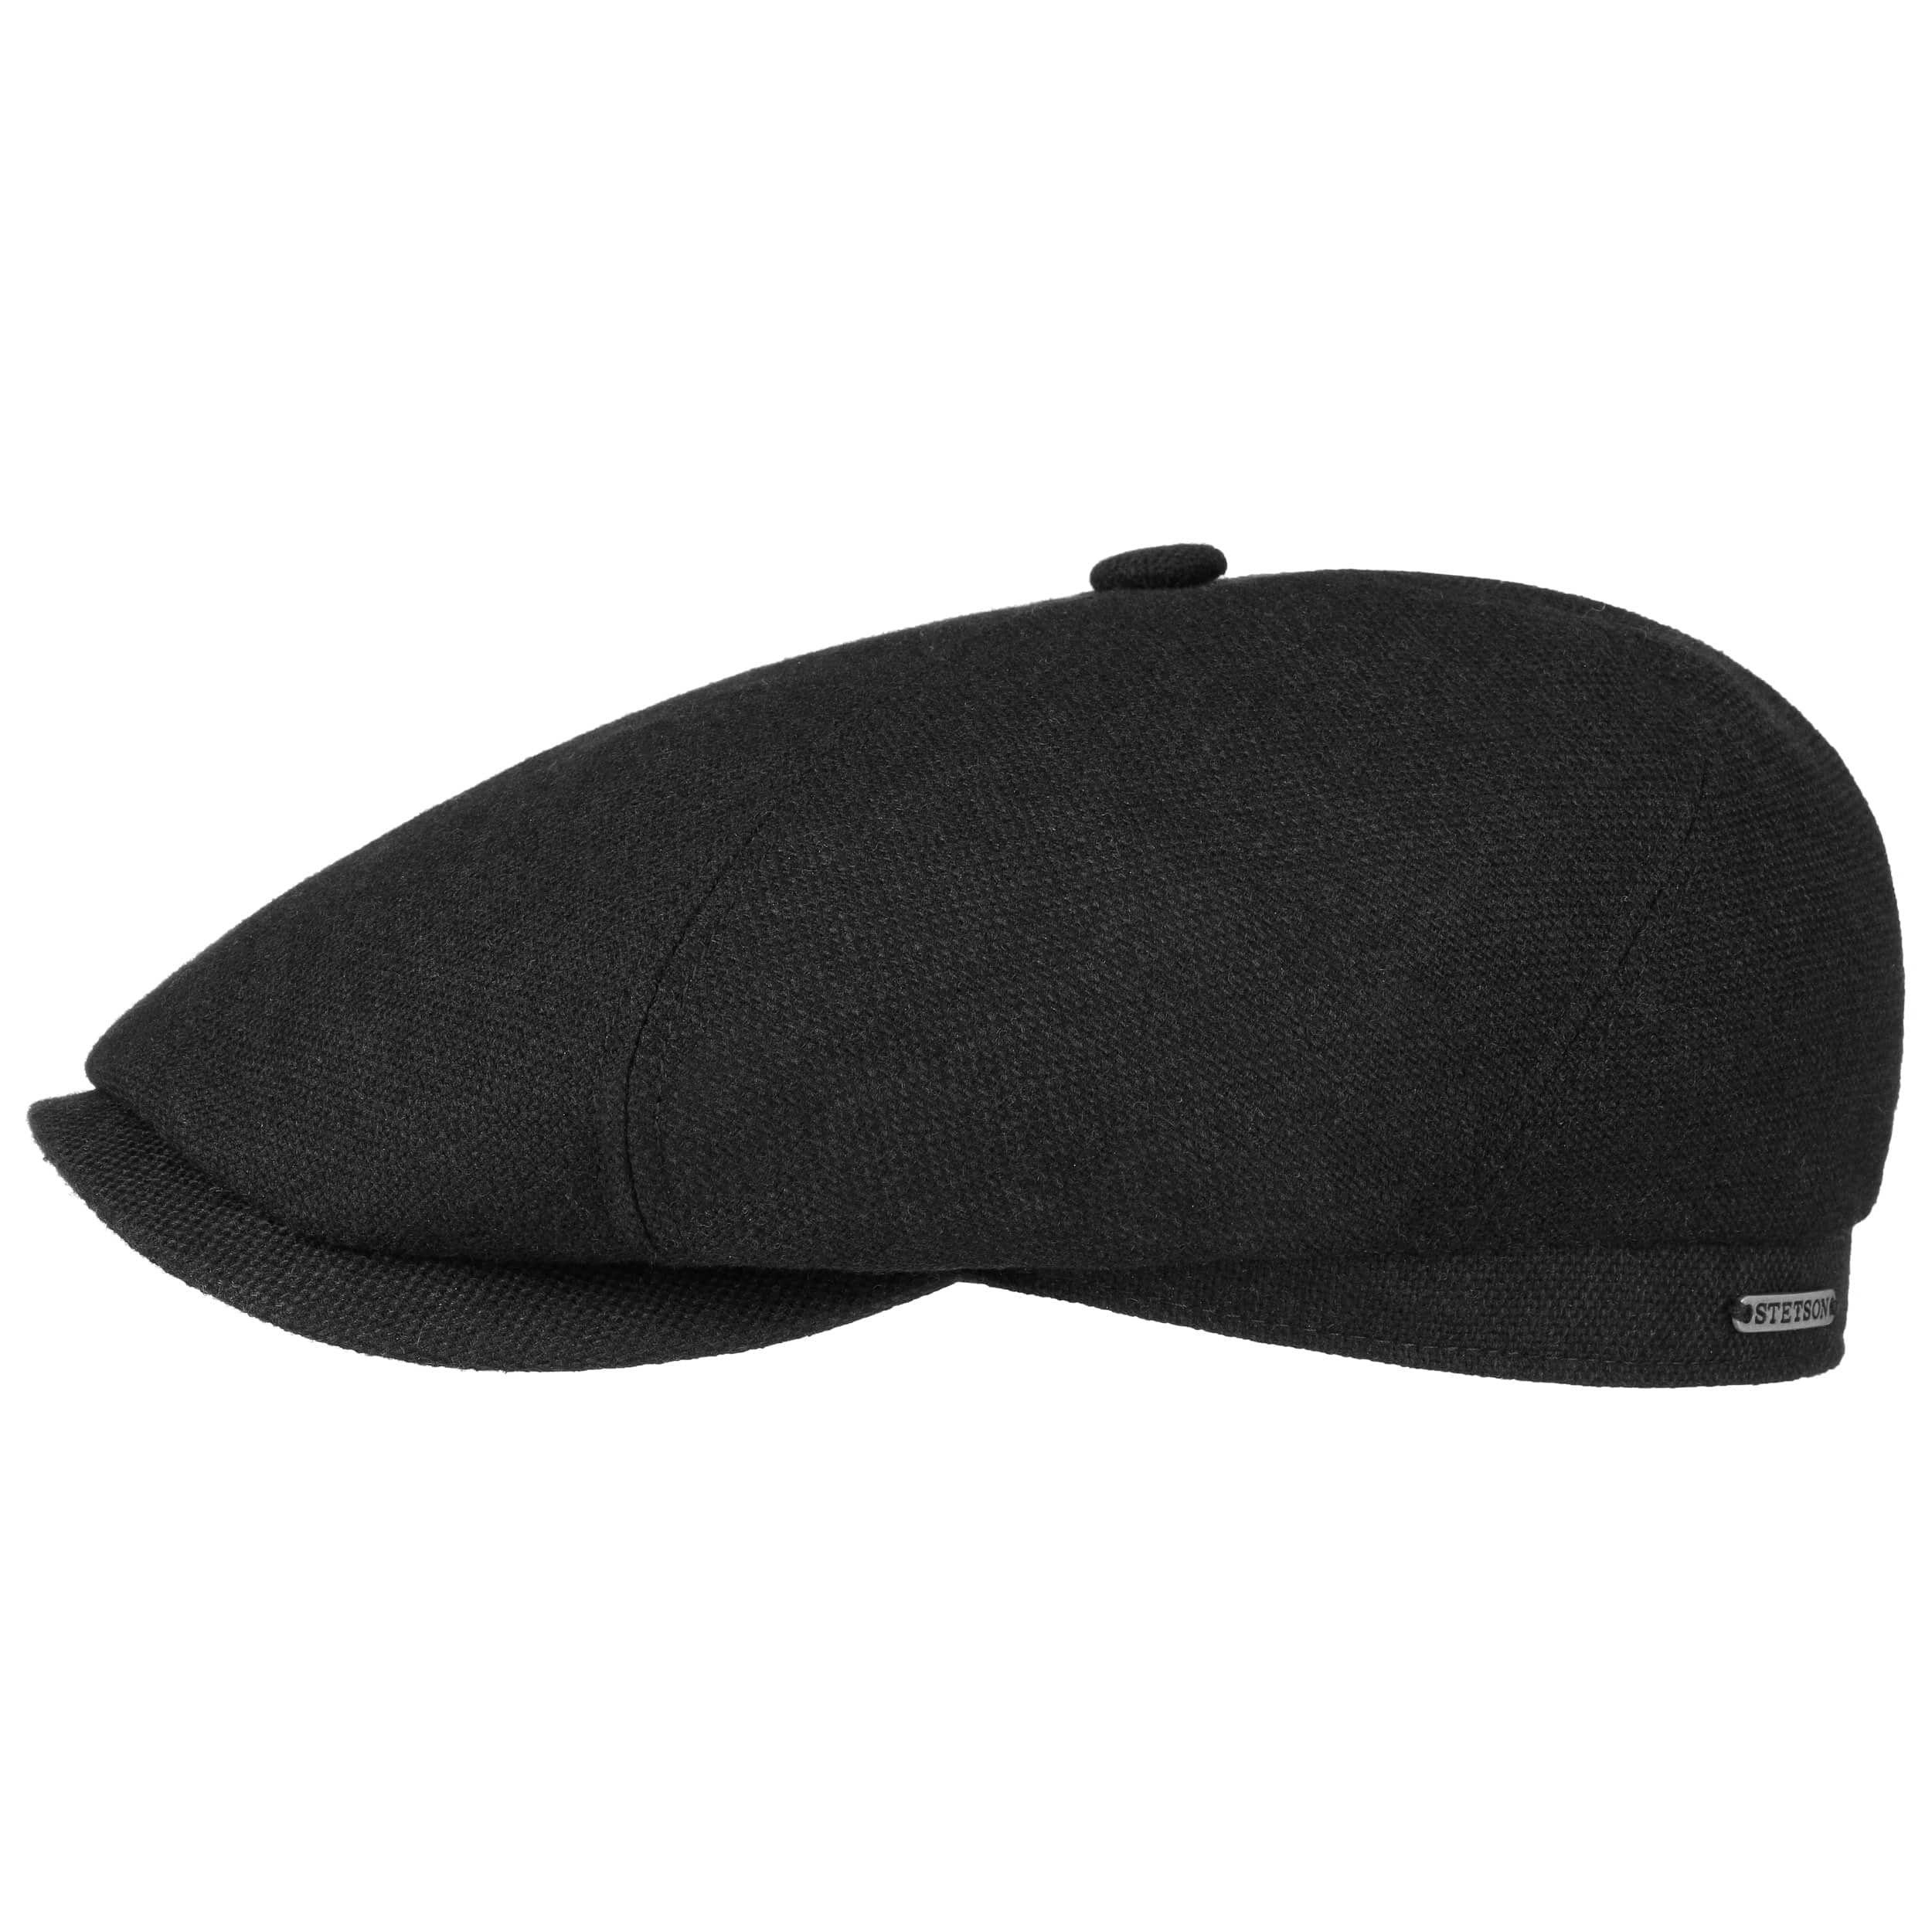 Brooklin Wool Cashmere Flat Cap black